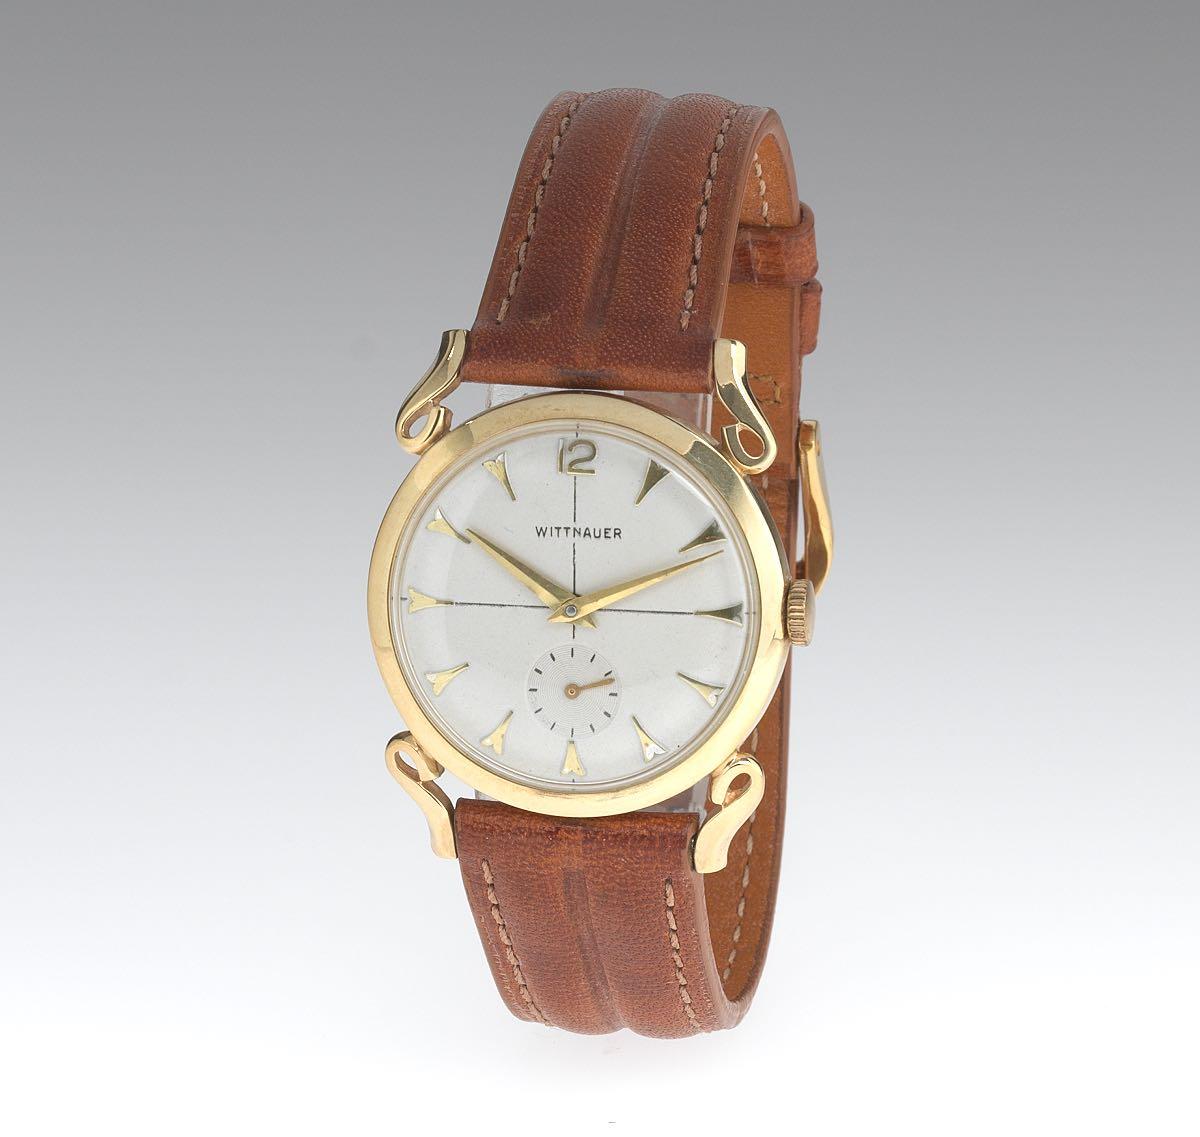 14k gold wittnauer fancy lug watch 022115 sold 575 14k gold wittnauer fancy lug watch sciox Choice Image